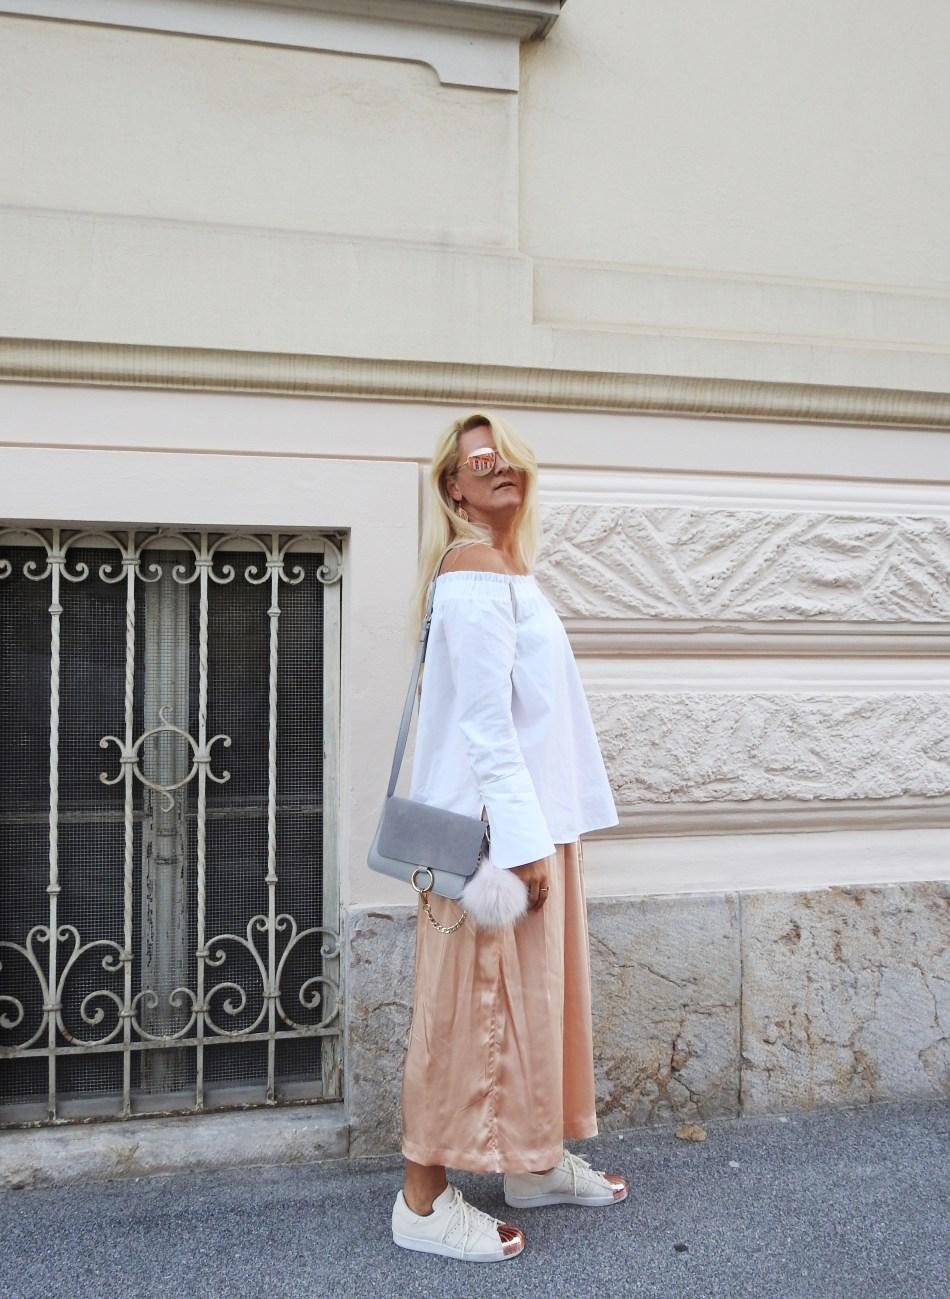 Culotte-Off-Shoulder-Blouse-Adidas-Metaltoe-Chloe-Bag-Dior-Sunglasses-Metallic-carrieslifestyle-Tamara-Prutsch